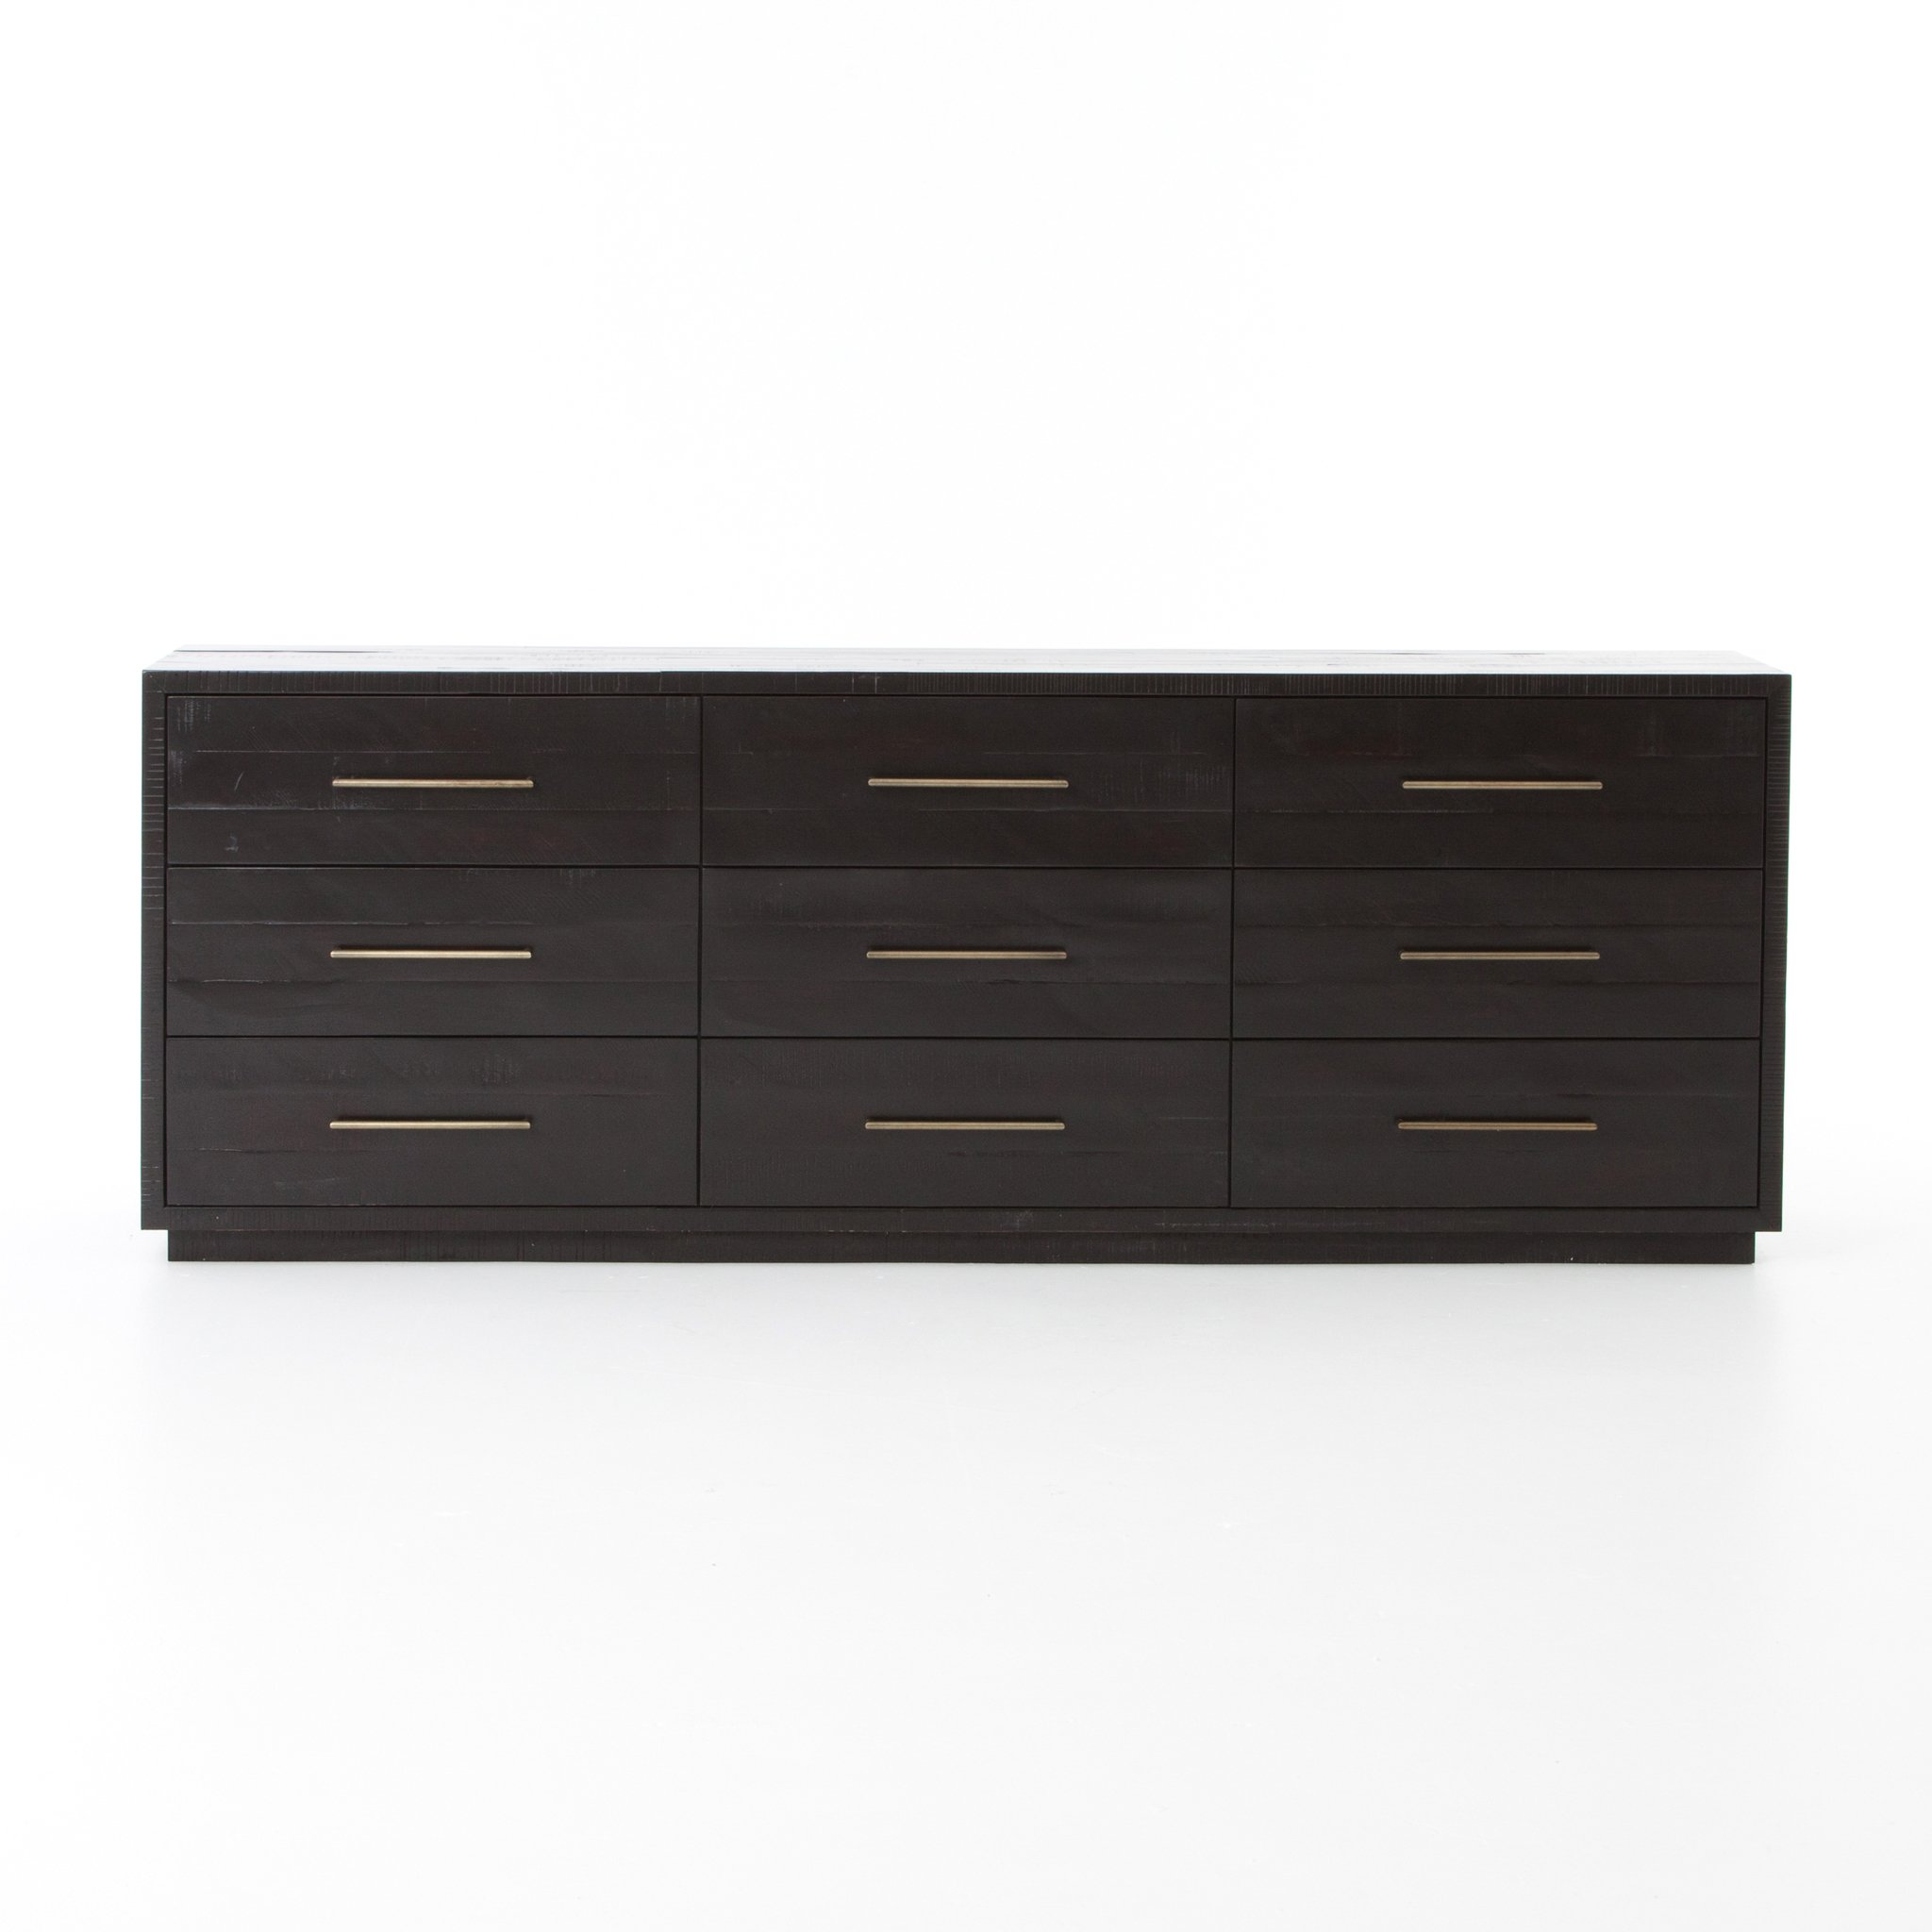 Suki 9 Drawer Dresser In Burnished Black 9 Drawer Dresser Dresser Drawers Furniture [ 2048 x 2048 Pixel ]